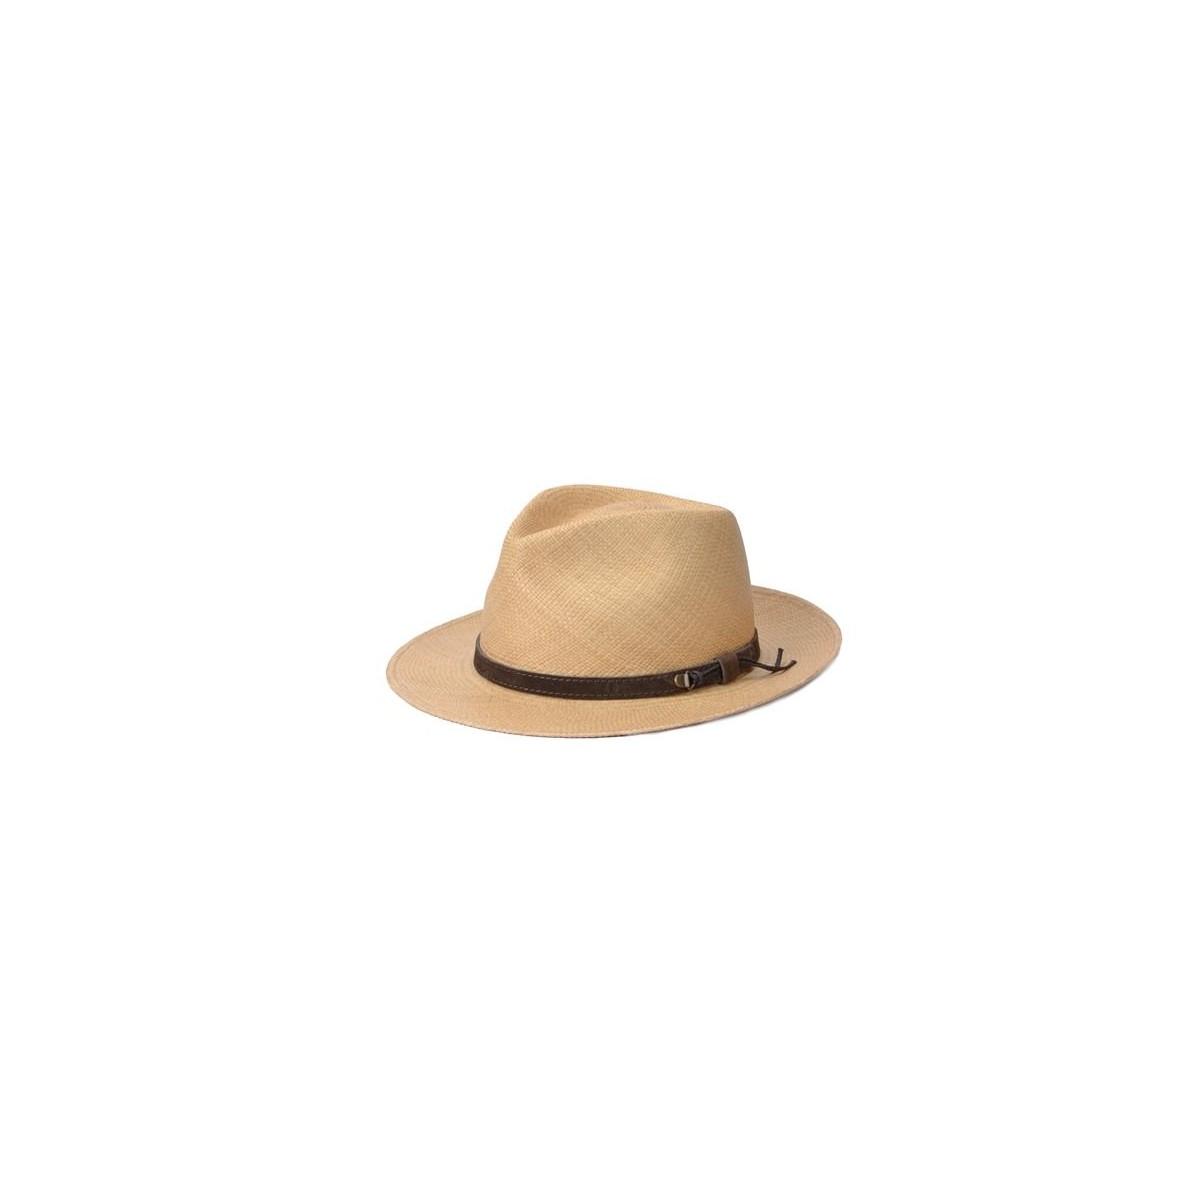 sombrero-hombre-panama-ance-paja-toquilla-habano-Fernandez-y-Roche